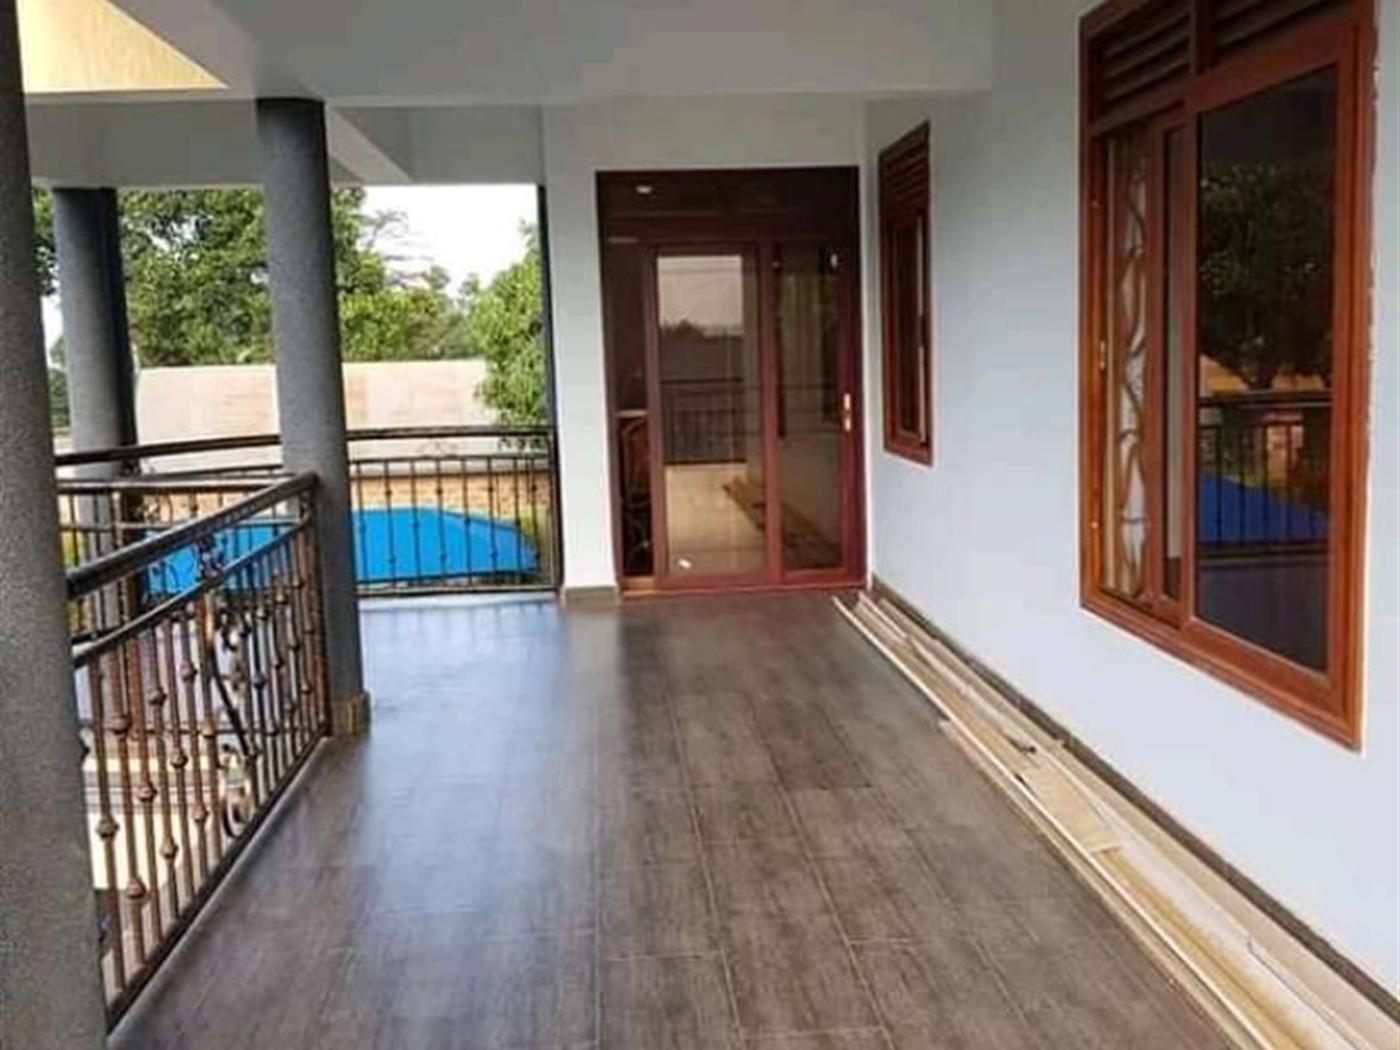 Mansion for sale in Kiira Wakiso